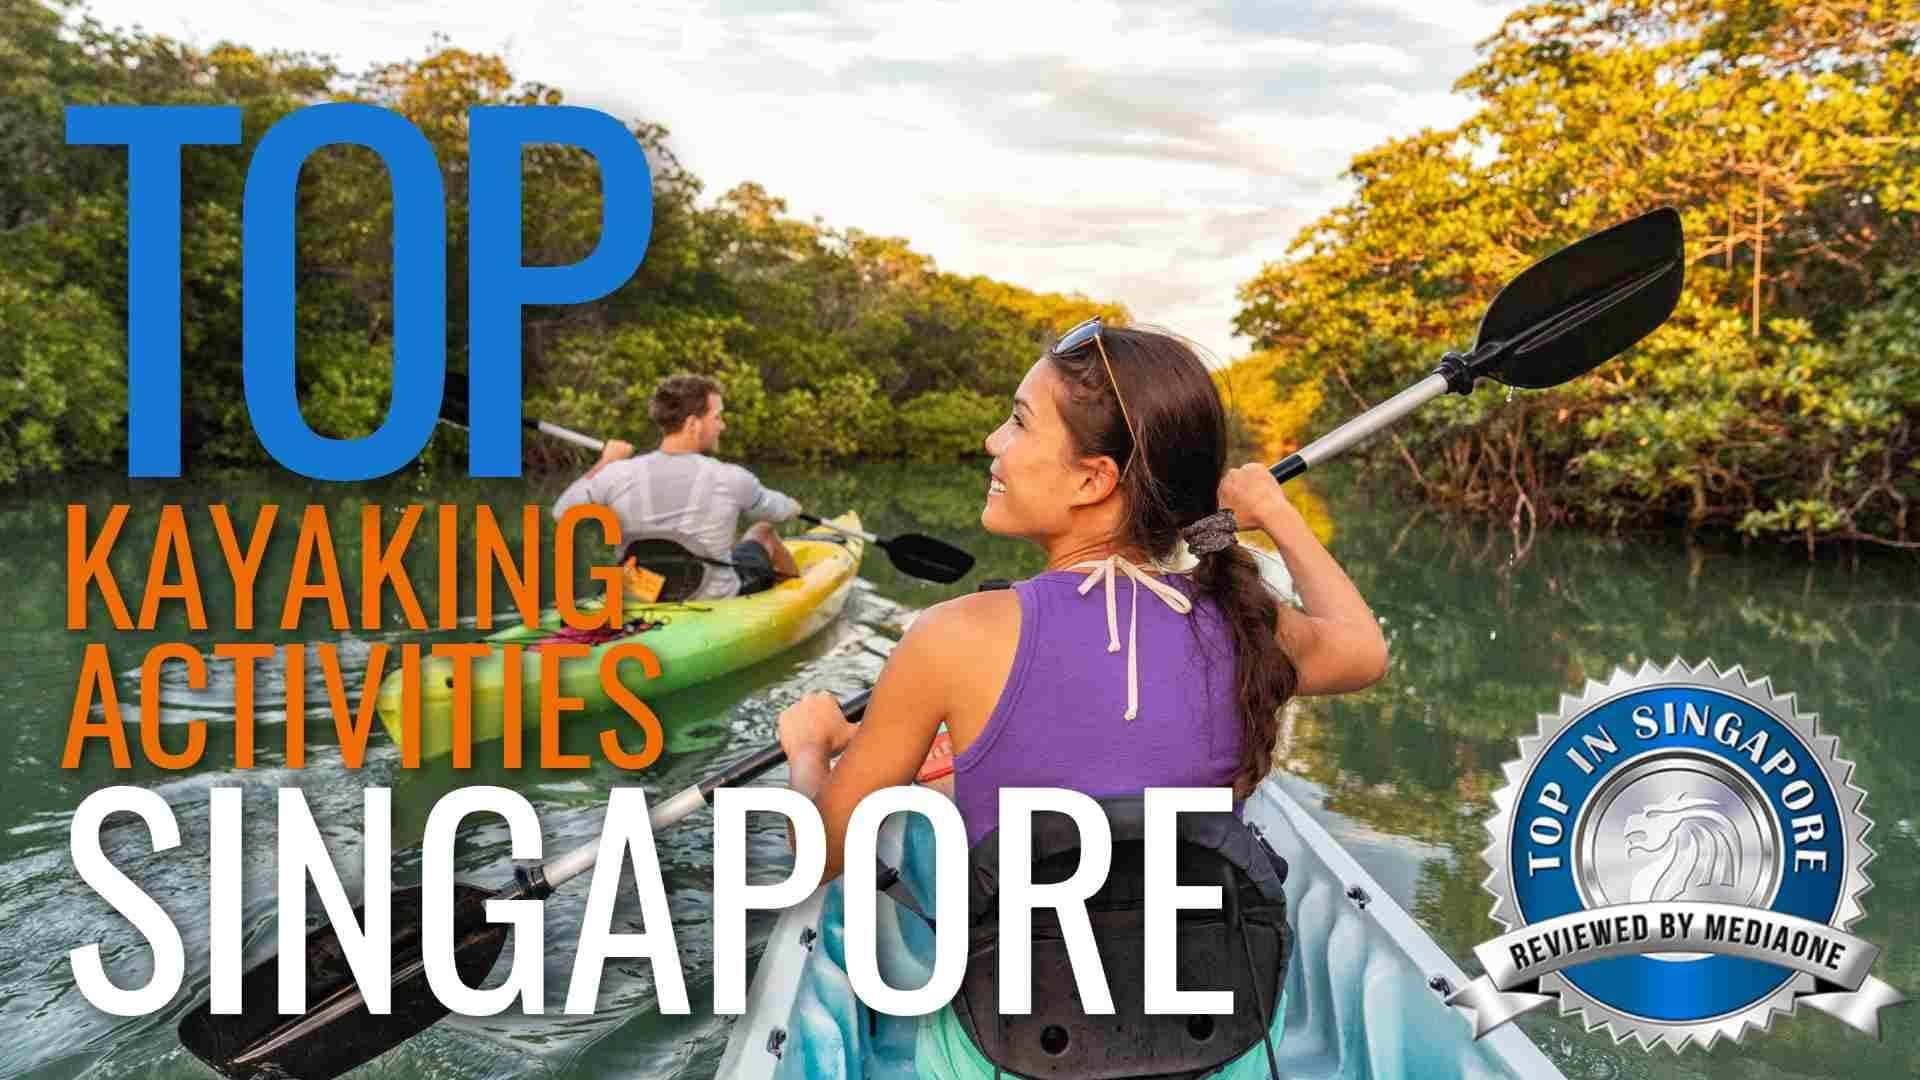 Top Kayaking Activities In Singapore (1)